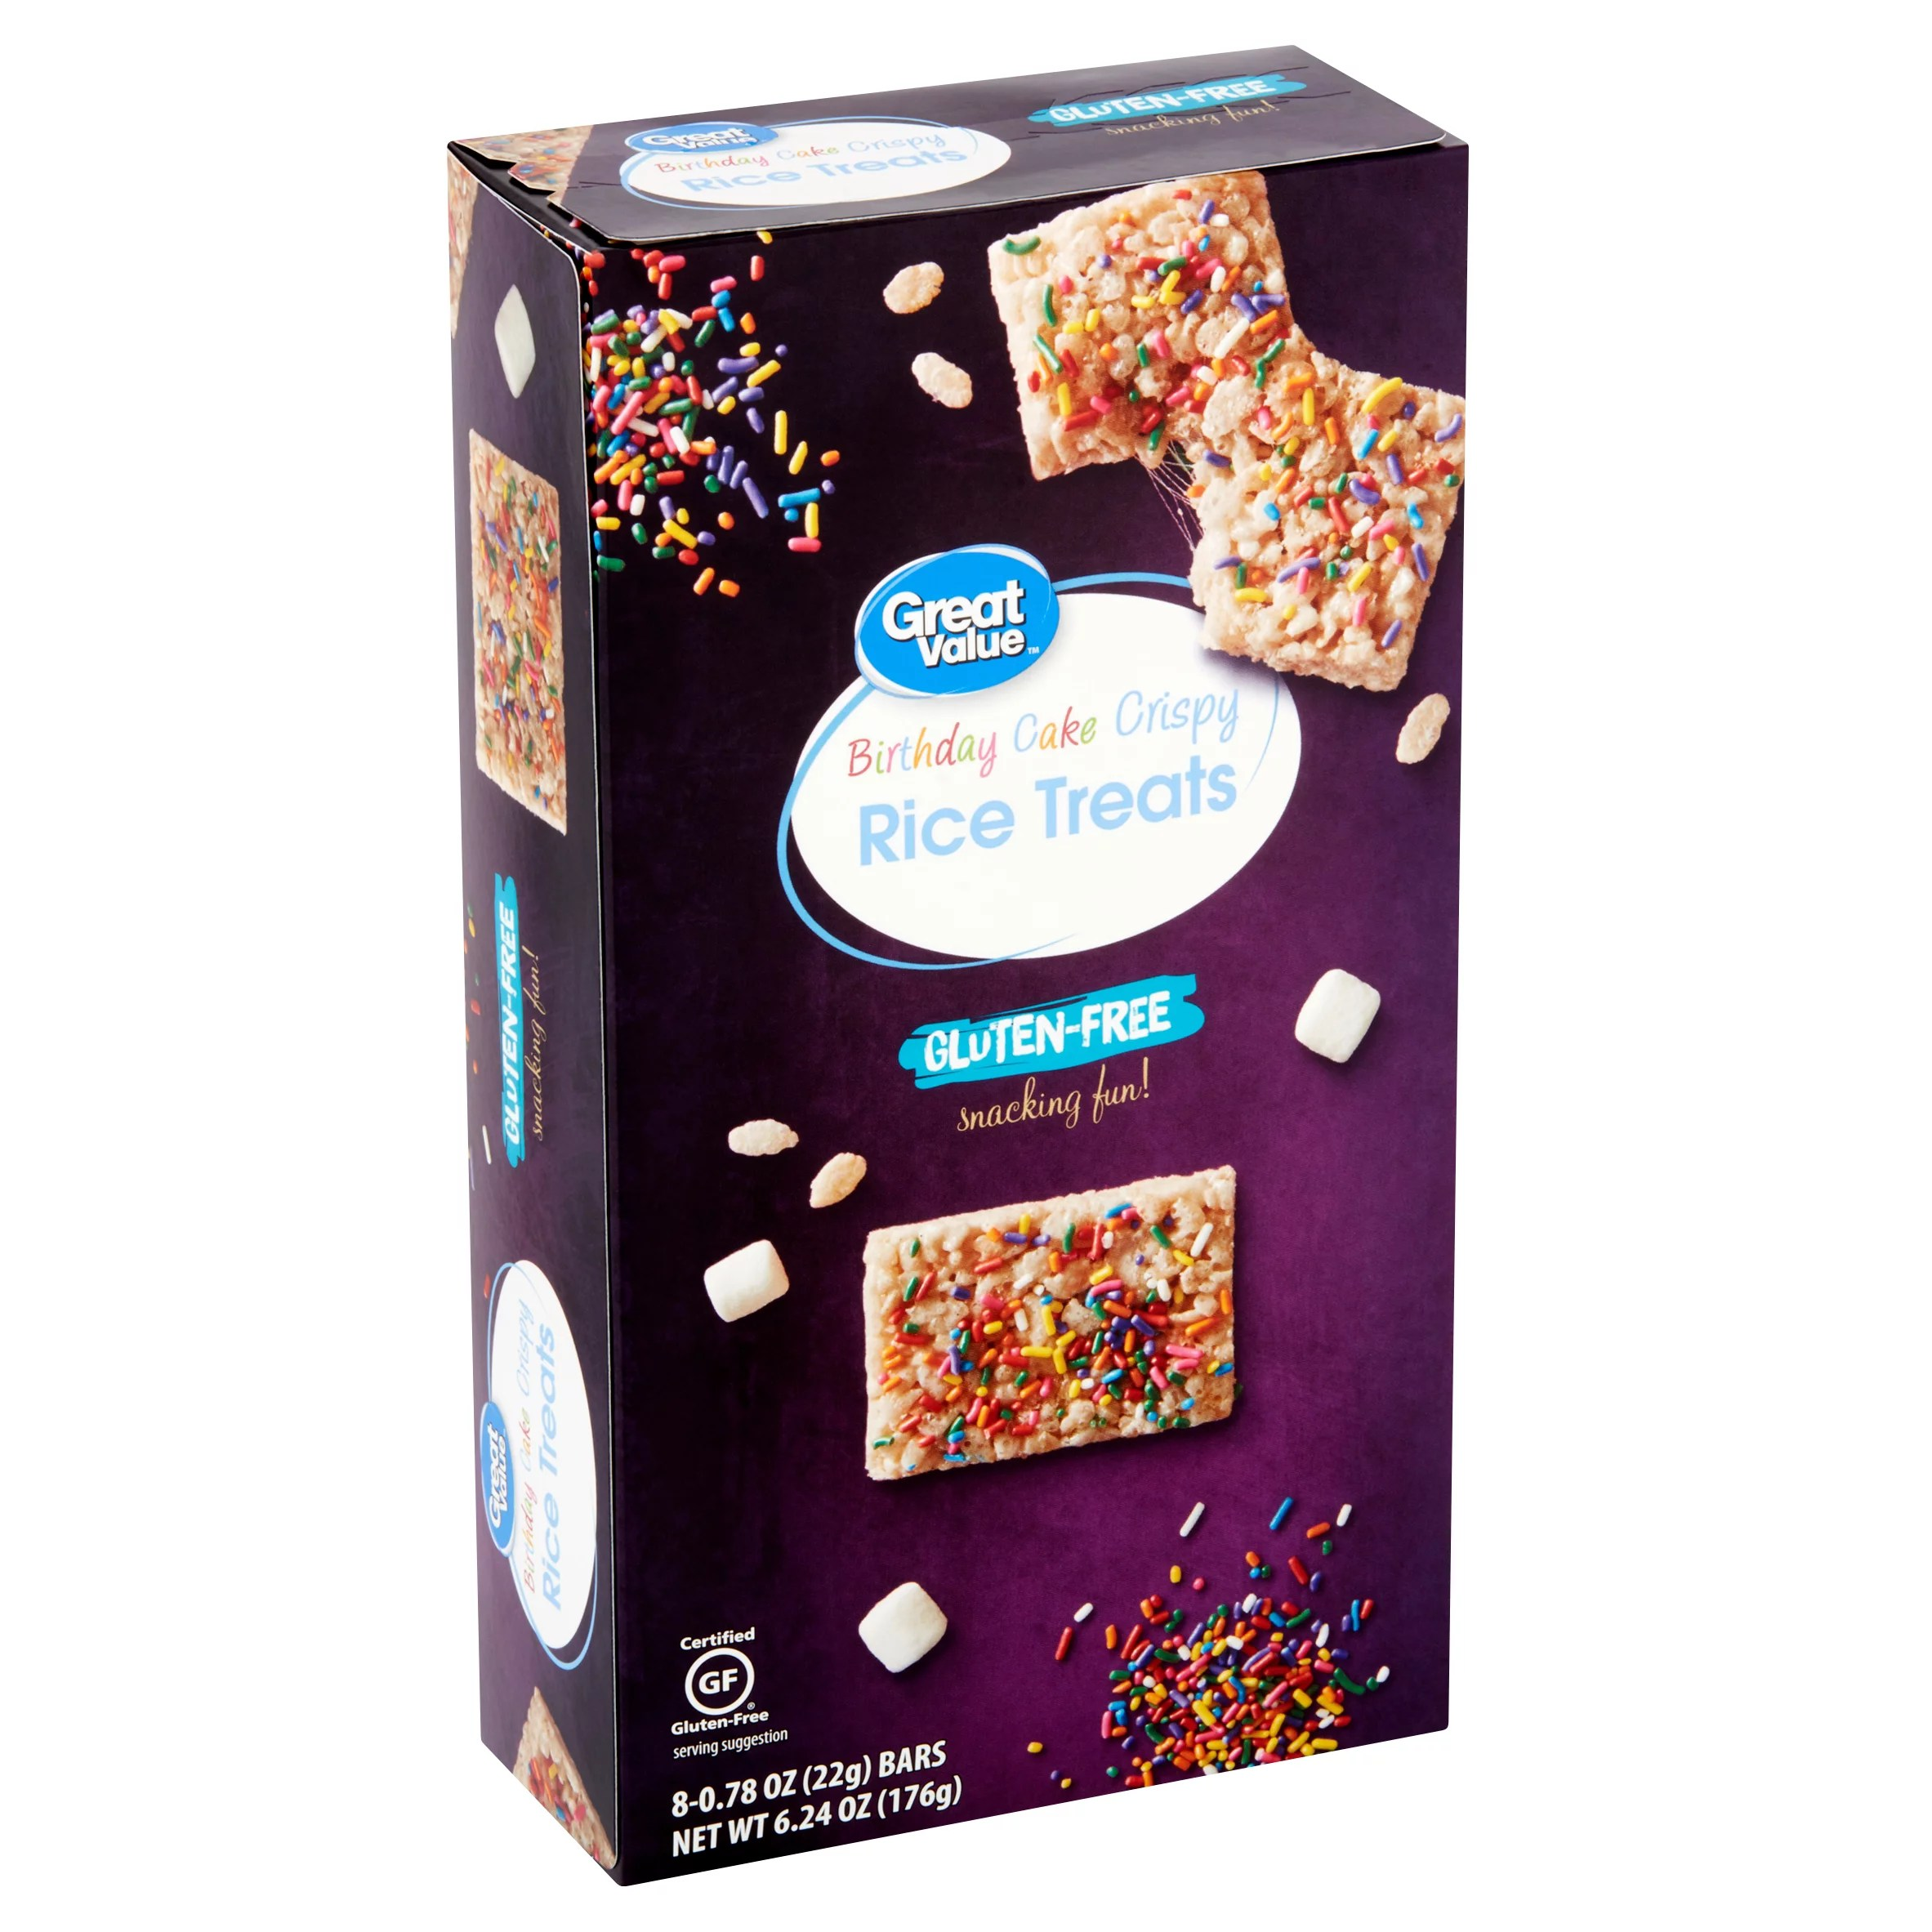 Great Value Birthday Cake Crispy Rice Treats 0 78 Oz 8 Count Walmart Com Walmart Com